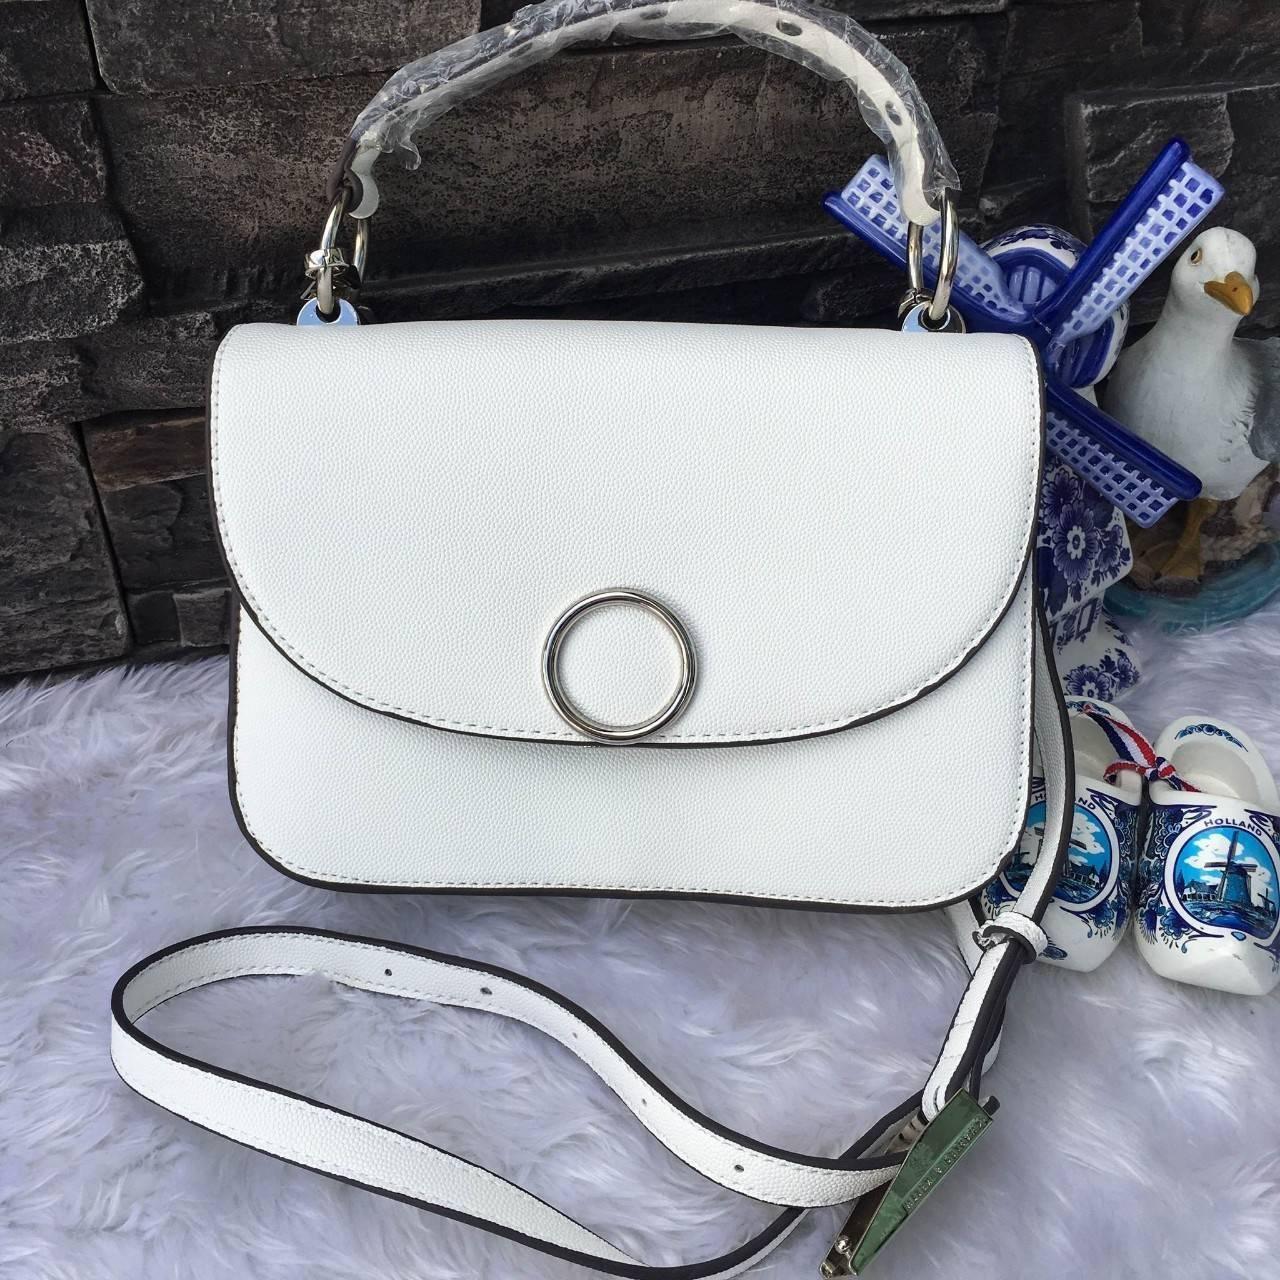 NEW 2017 CHARLES & KIETH CIRCULAR DETAIL HANDBAG กระเป๋าสะพาย ขนาดกำลังดี สีขาว